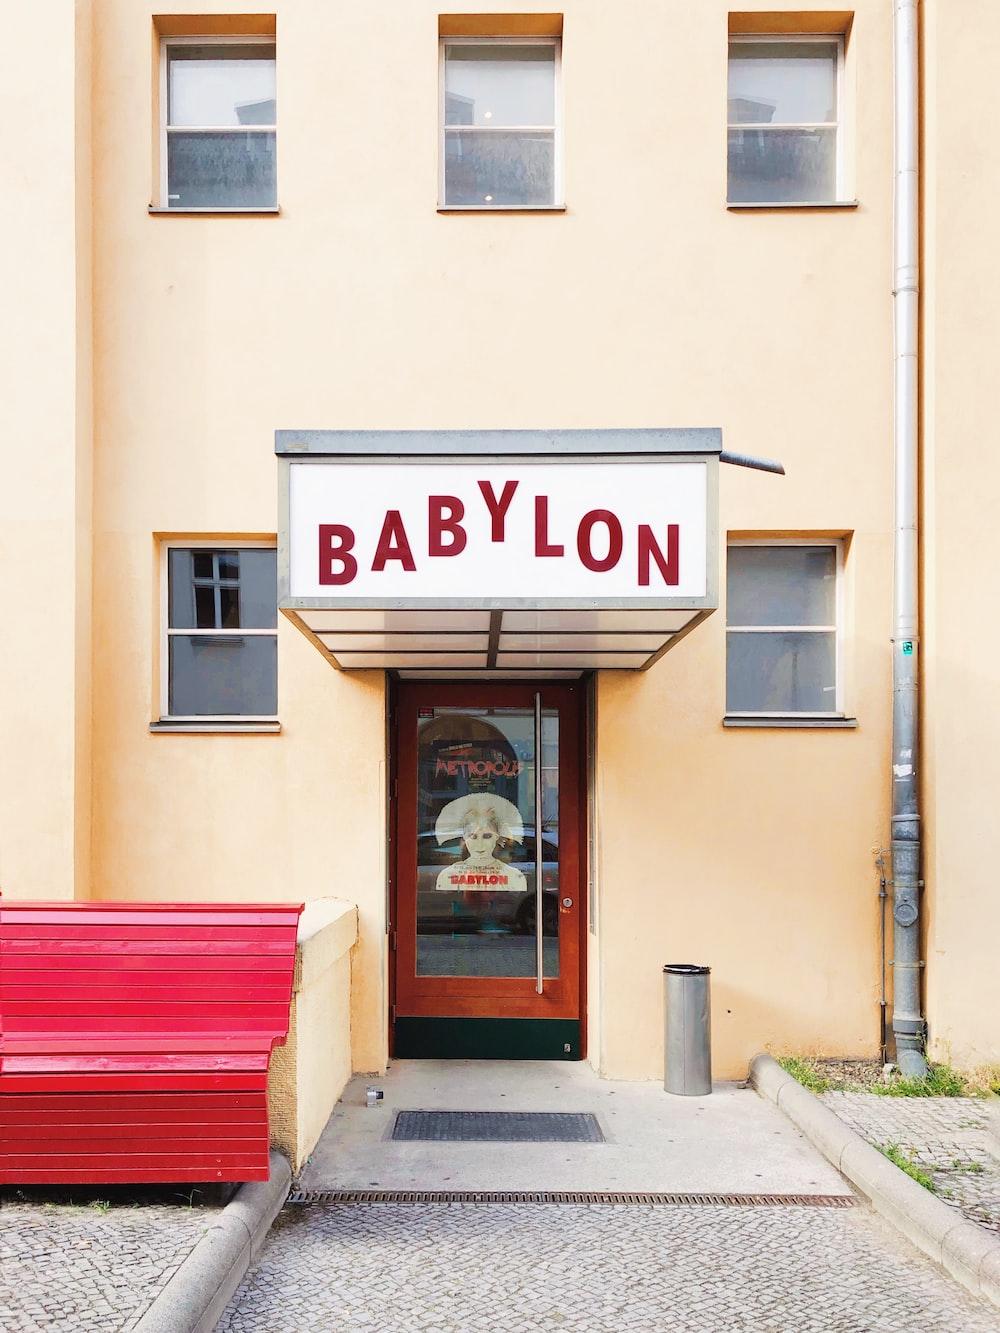 Babylon building